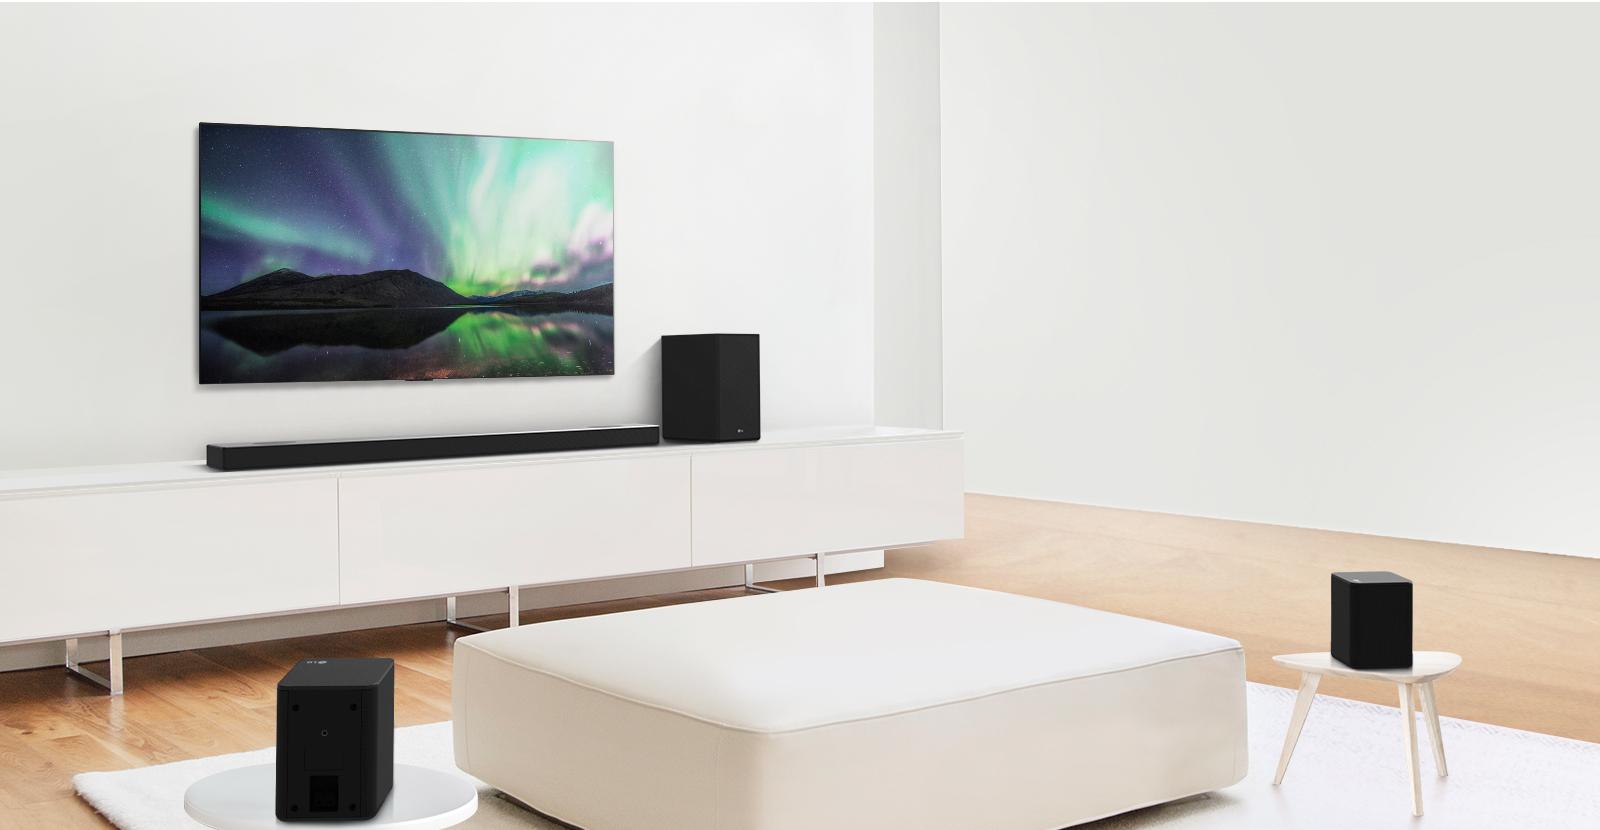 LG SN11RG Soundbar